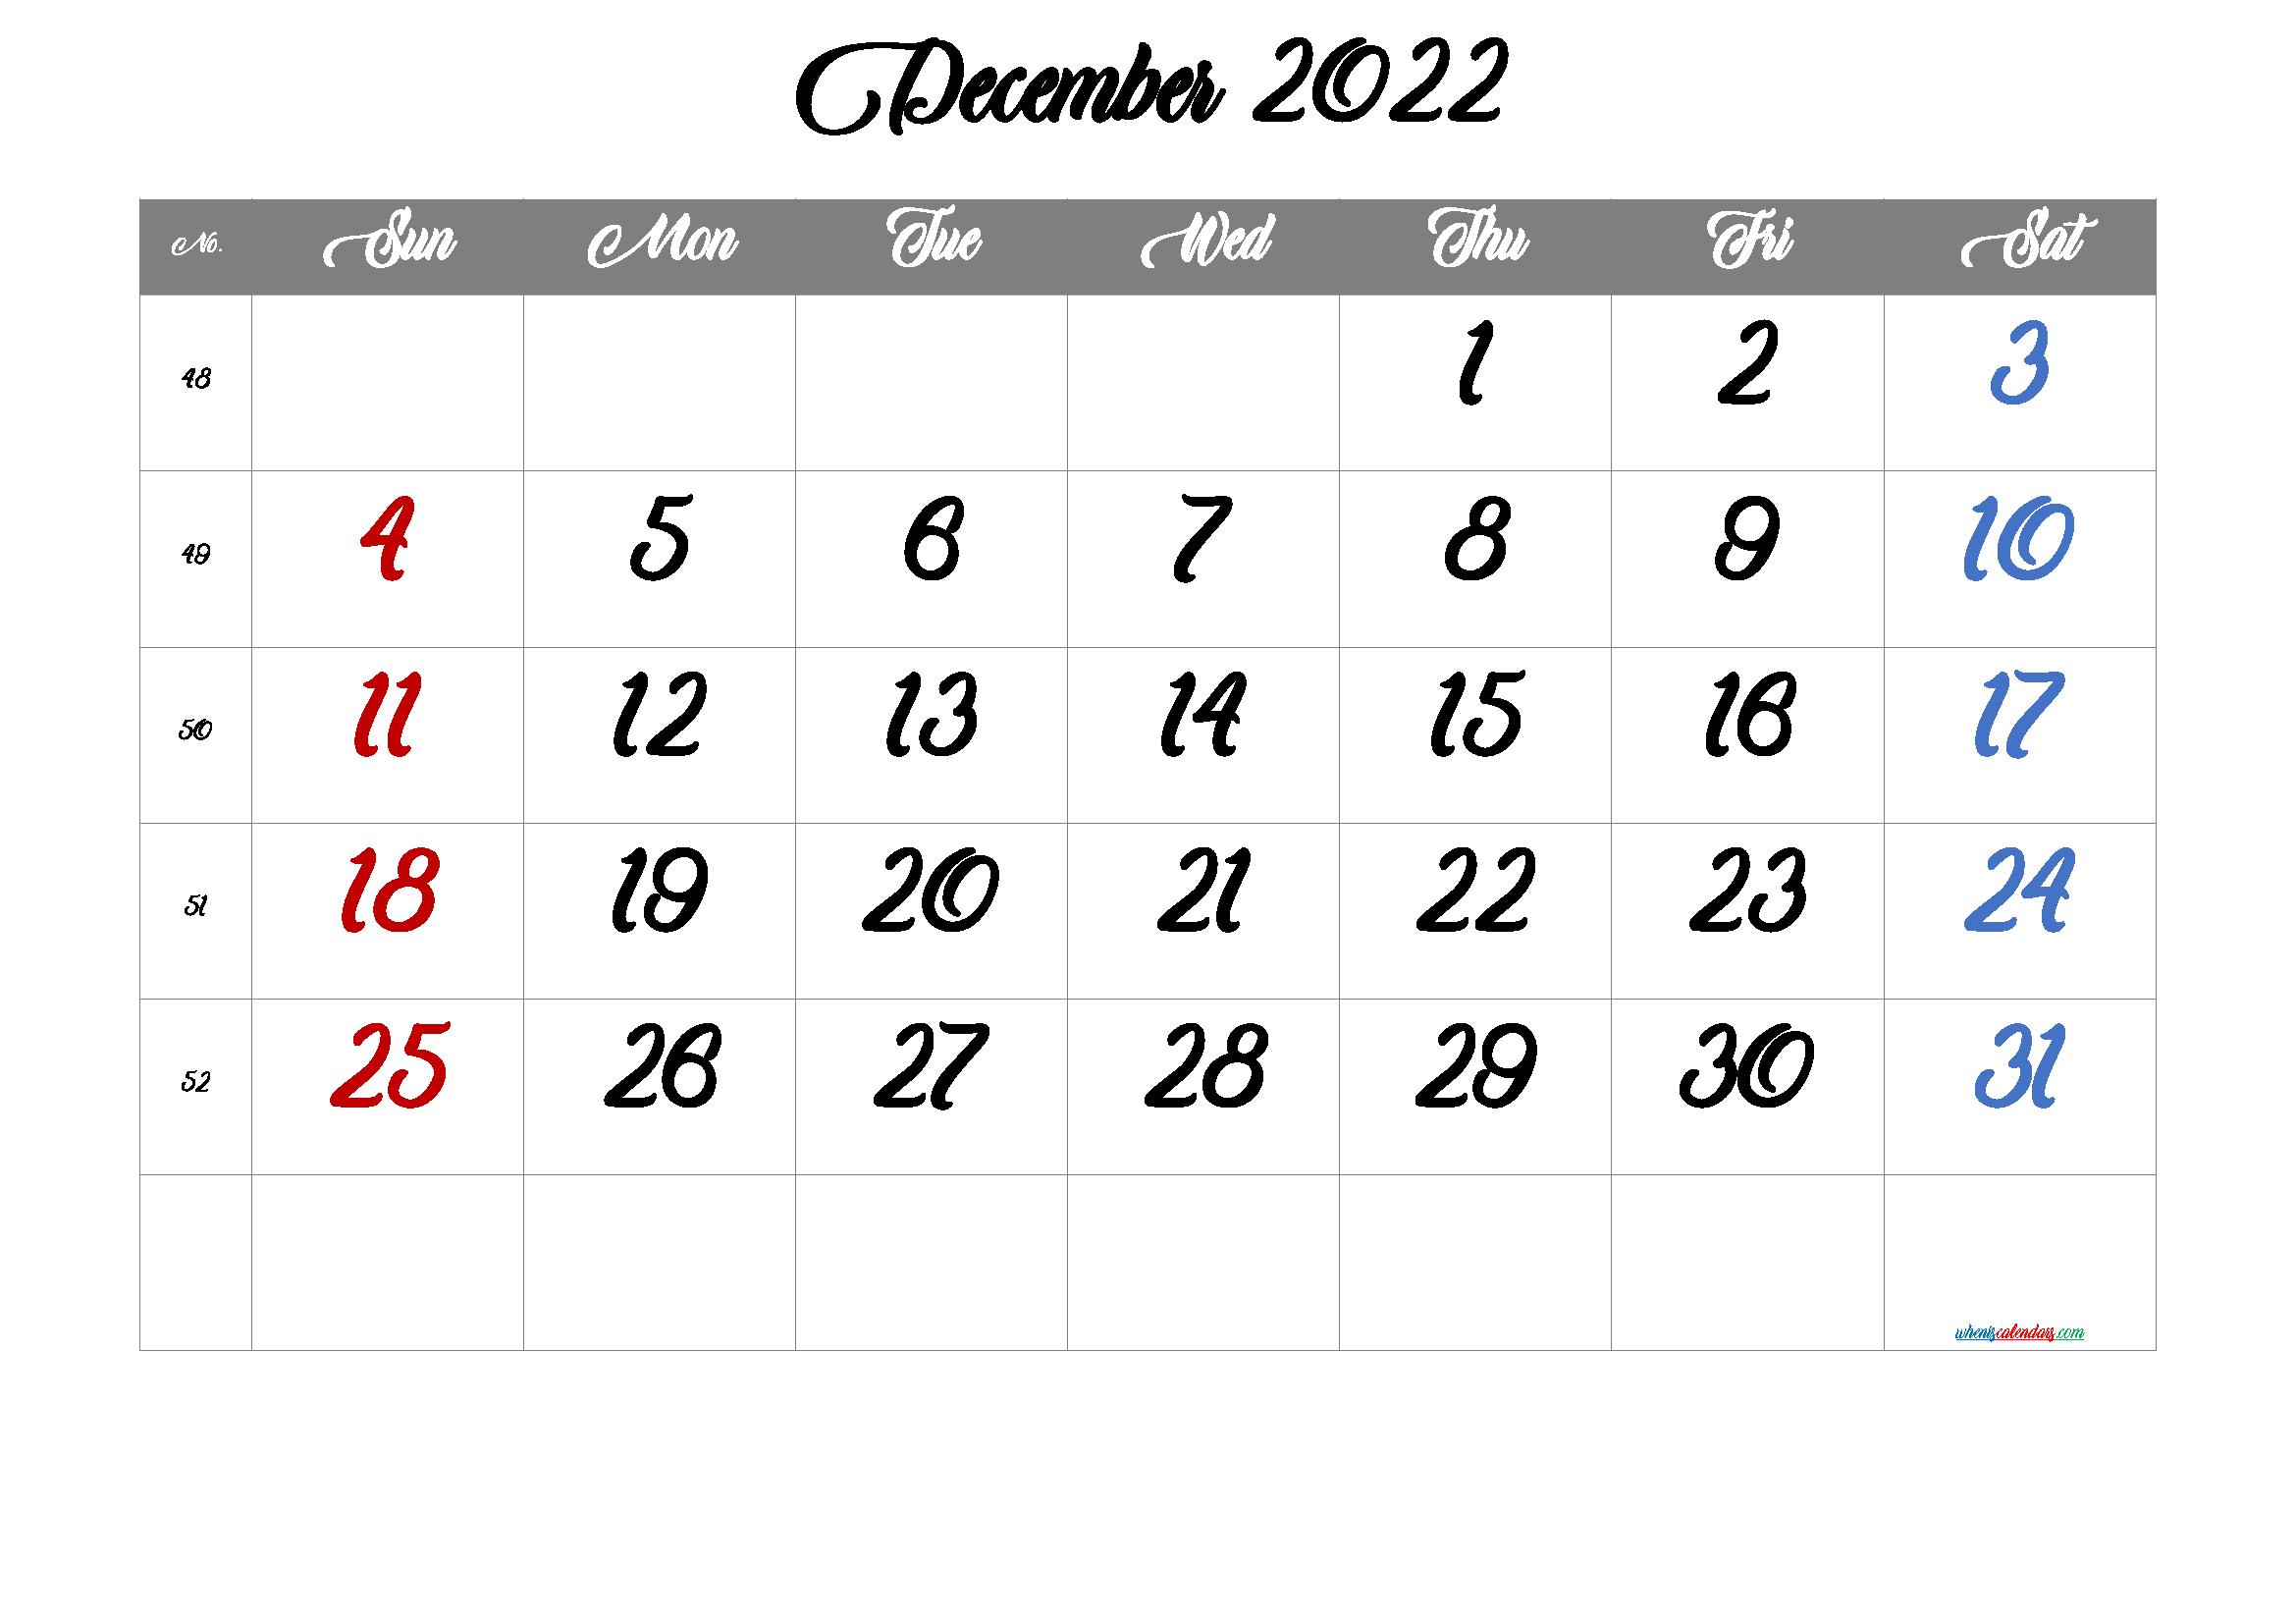 Free Printable December 2022 Calendar 12 Templates - Free ...